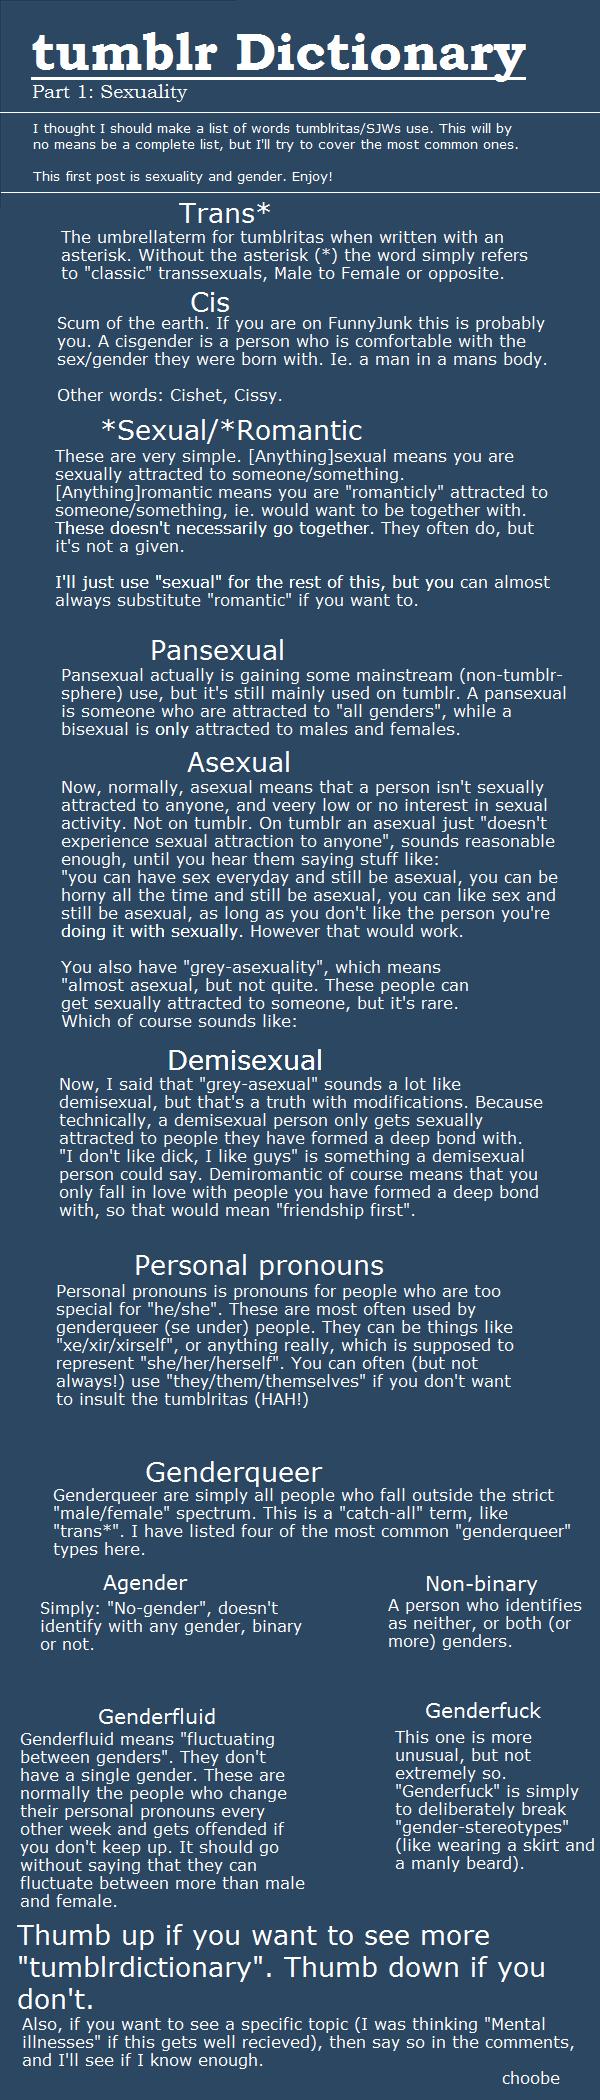 Gender dictionary tumblr